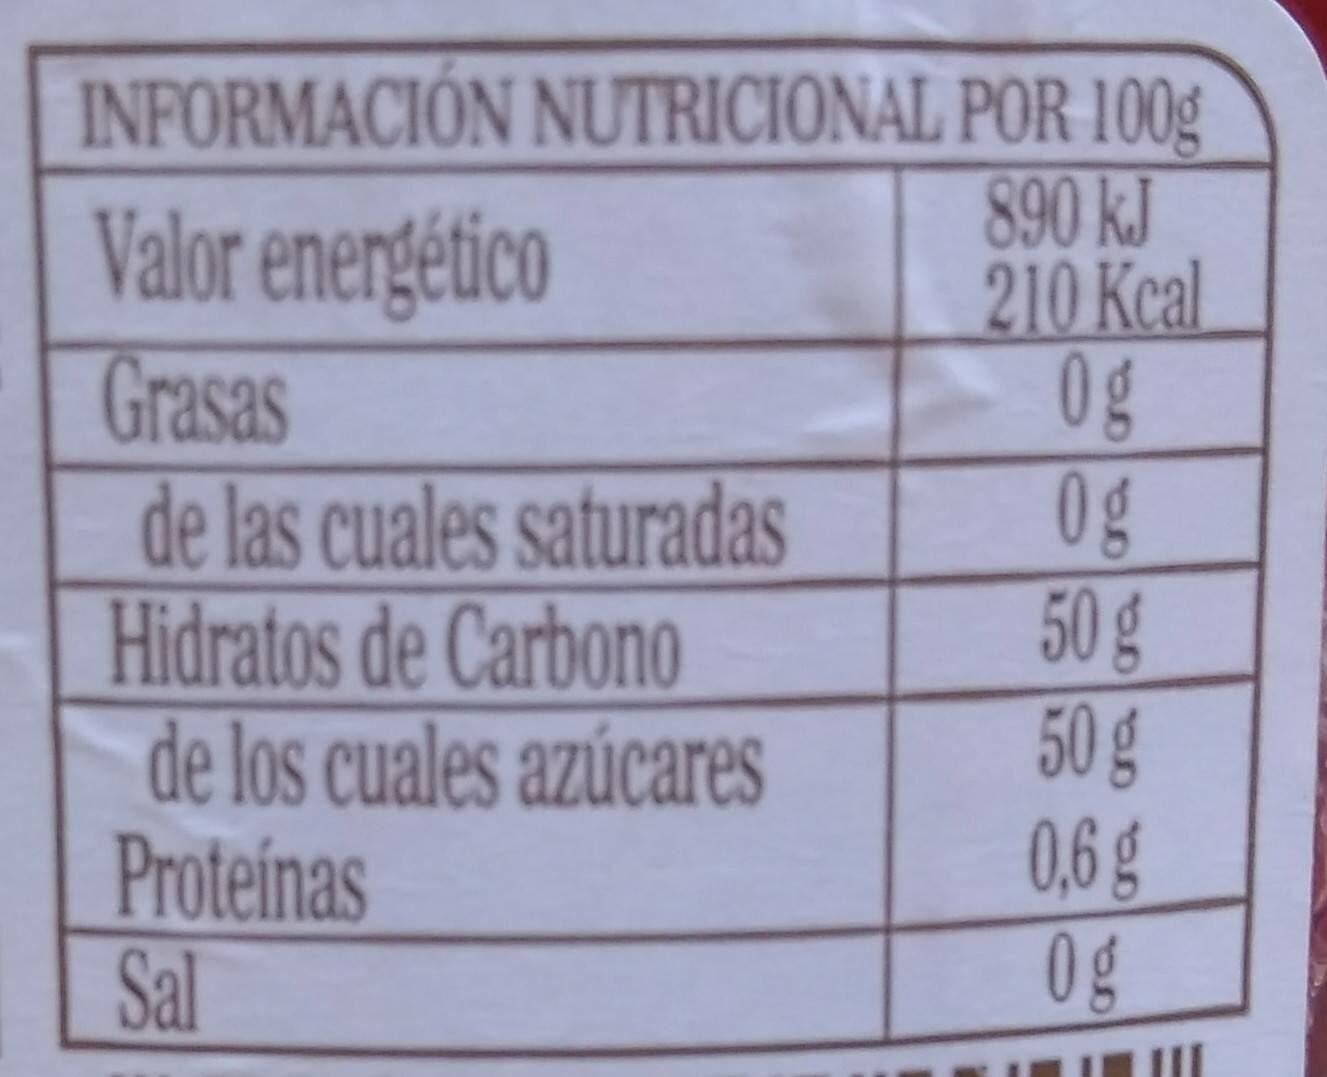 Mermelada de frambuesas - Nutrition facts - la